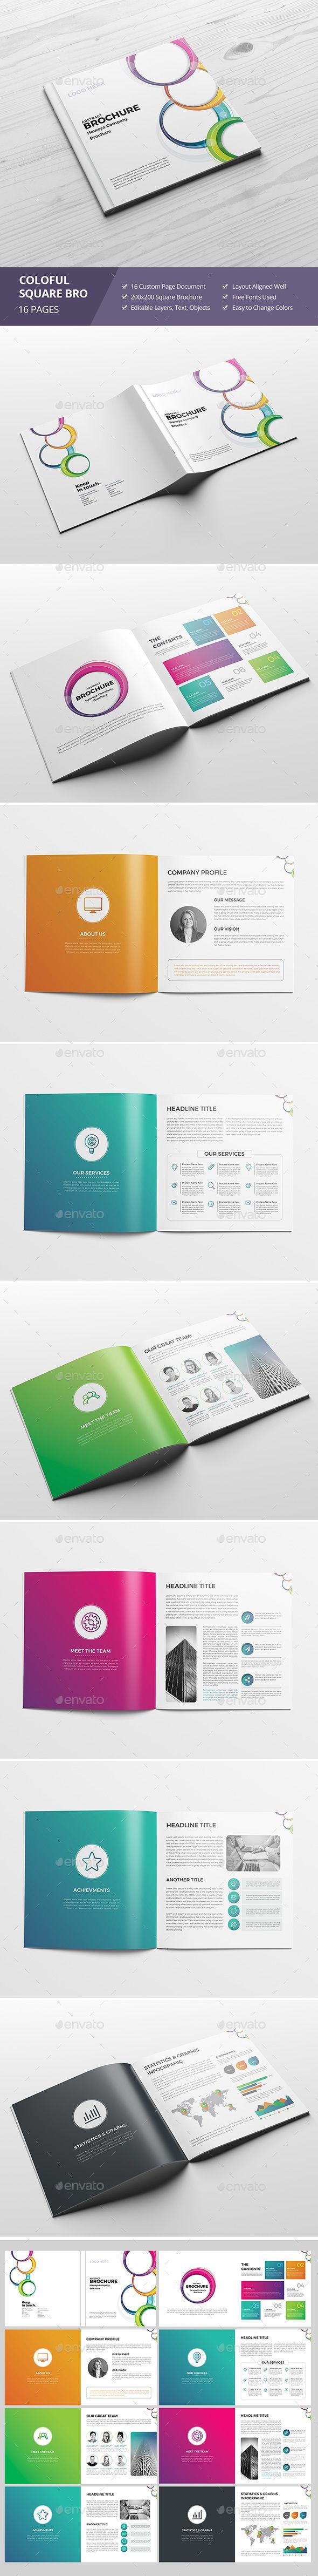 Haweya Colorful Square Brochure V03 | Pinterest | Indesign templates ...